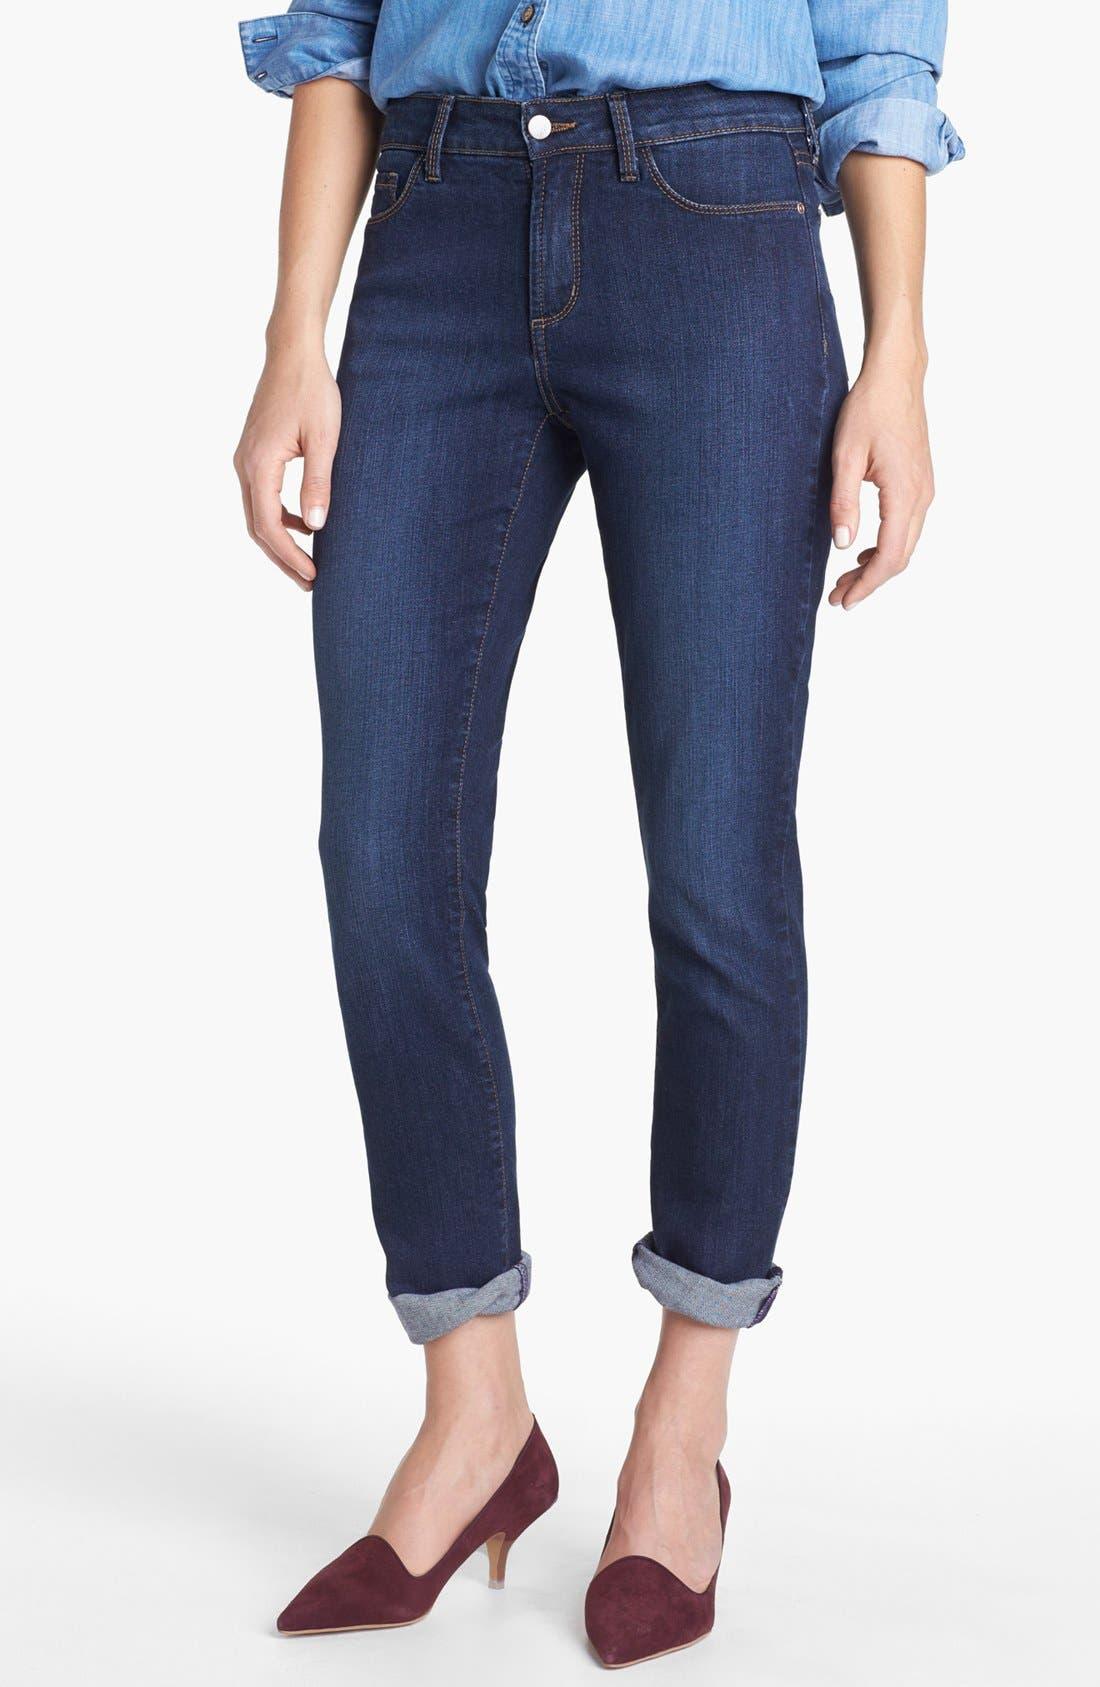 Alternate Image 1 Selected - NYDJ 'Leann' Stretch Skinny Boyfriend Jeans